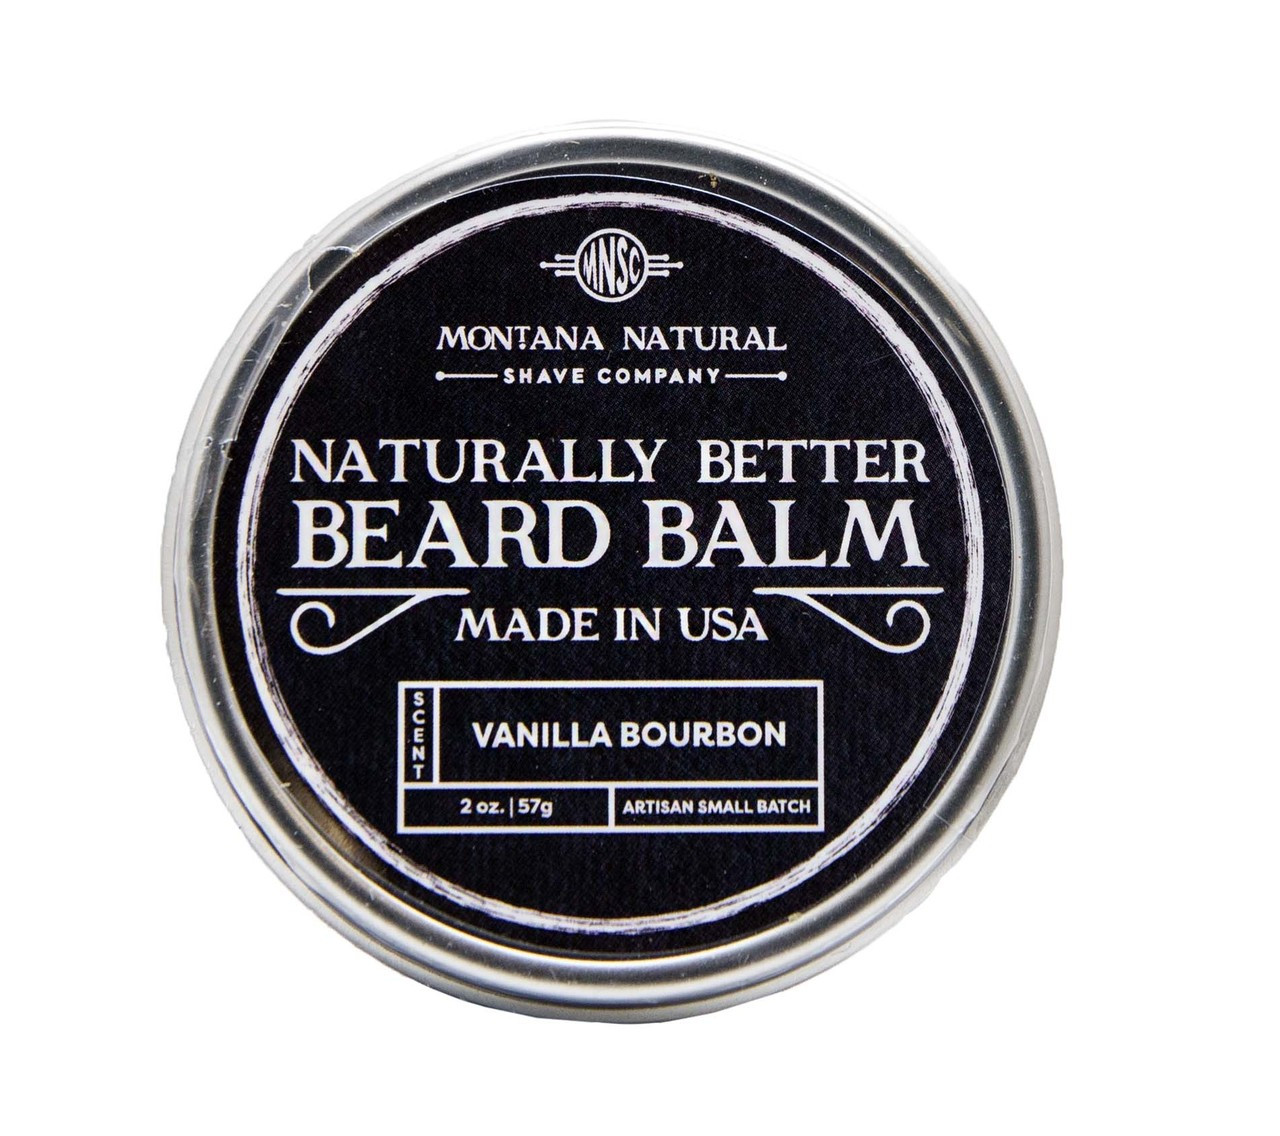 Small Batch Vanilla Bourbon Beard Balm Naturally Better - Montana Natural Shave Company